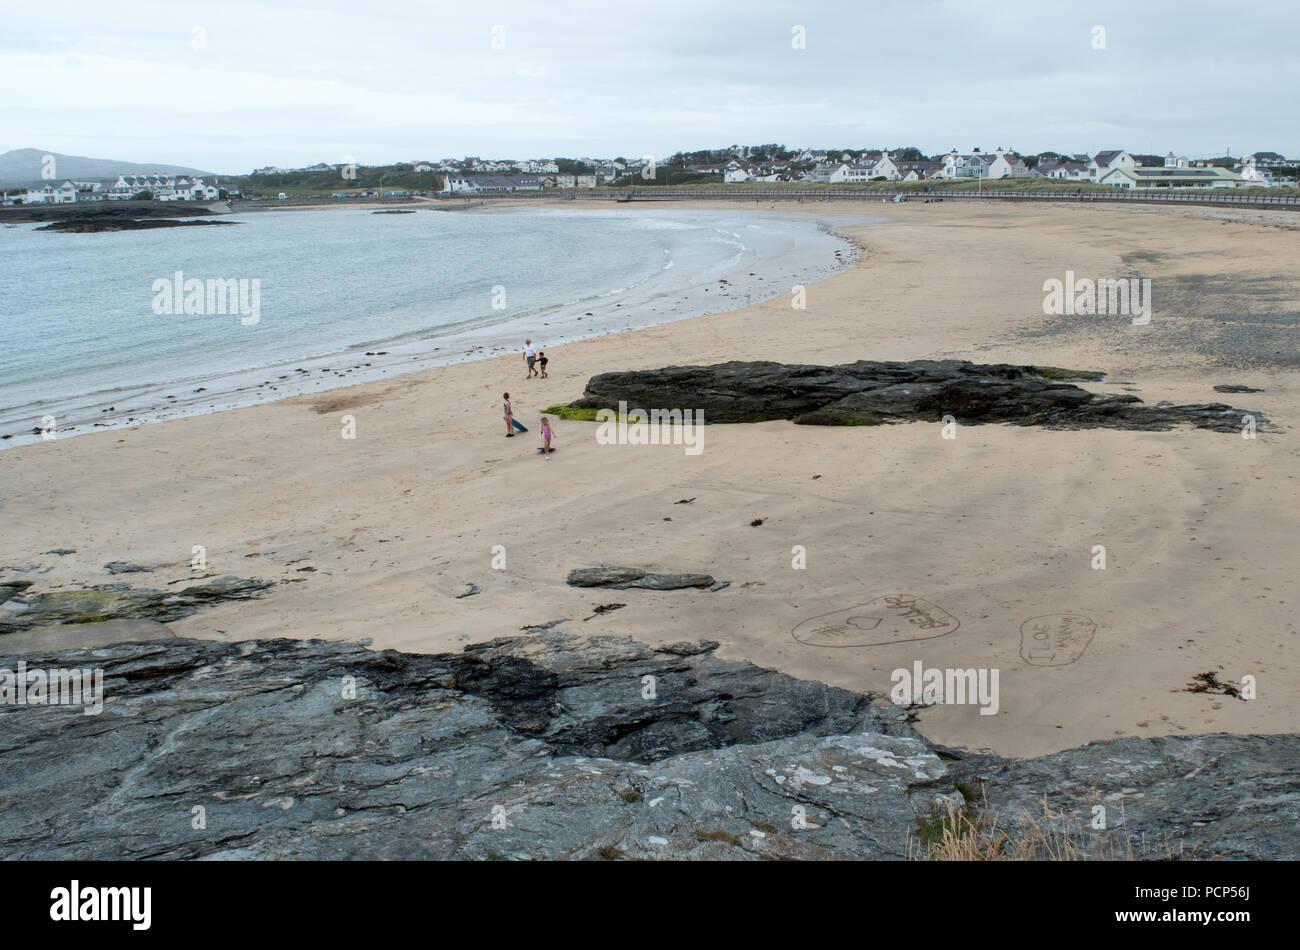 Trearddur bay Anglesey - Stock Image